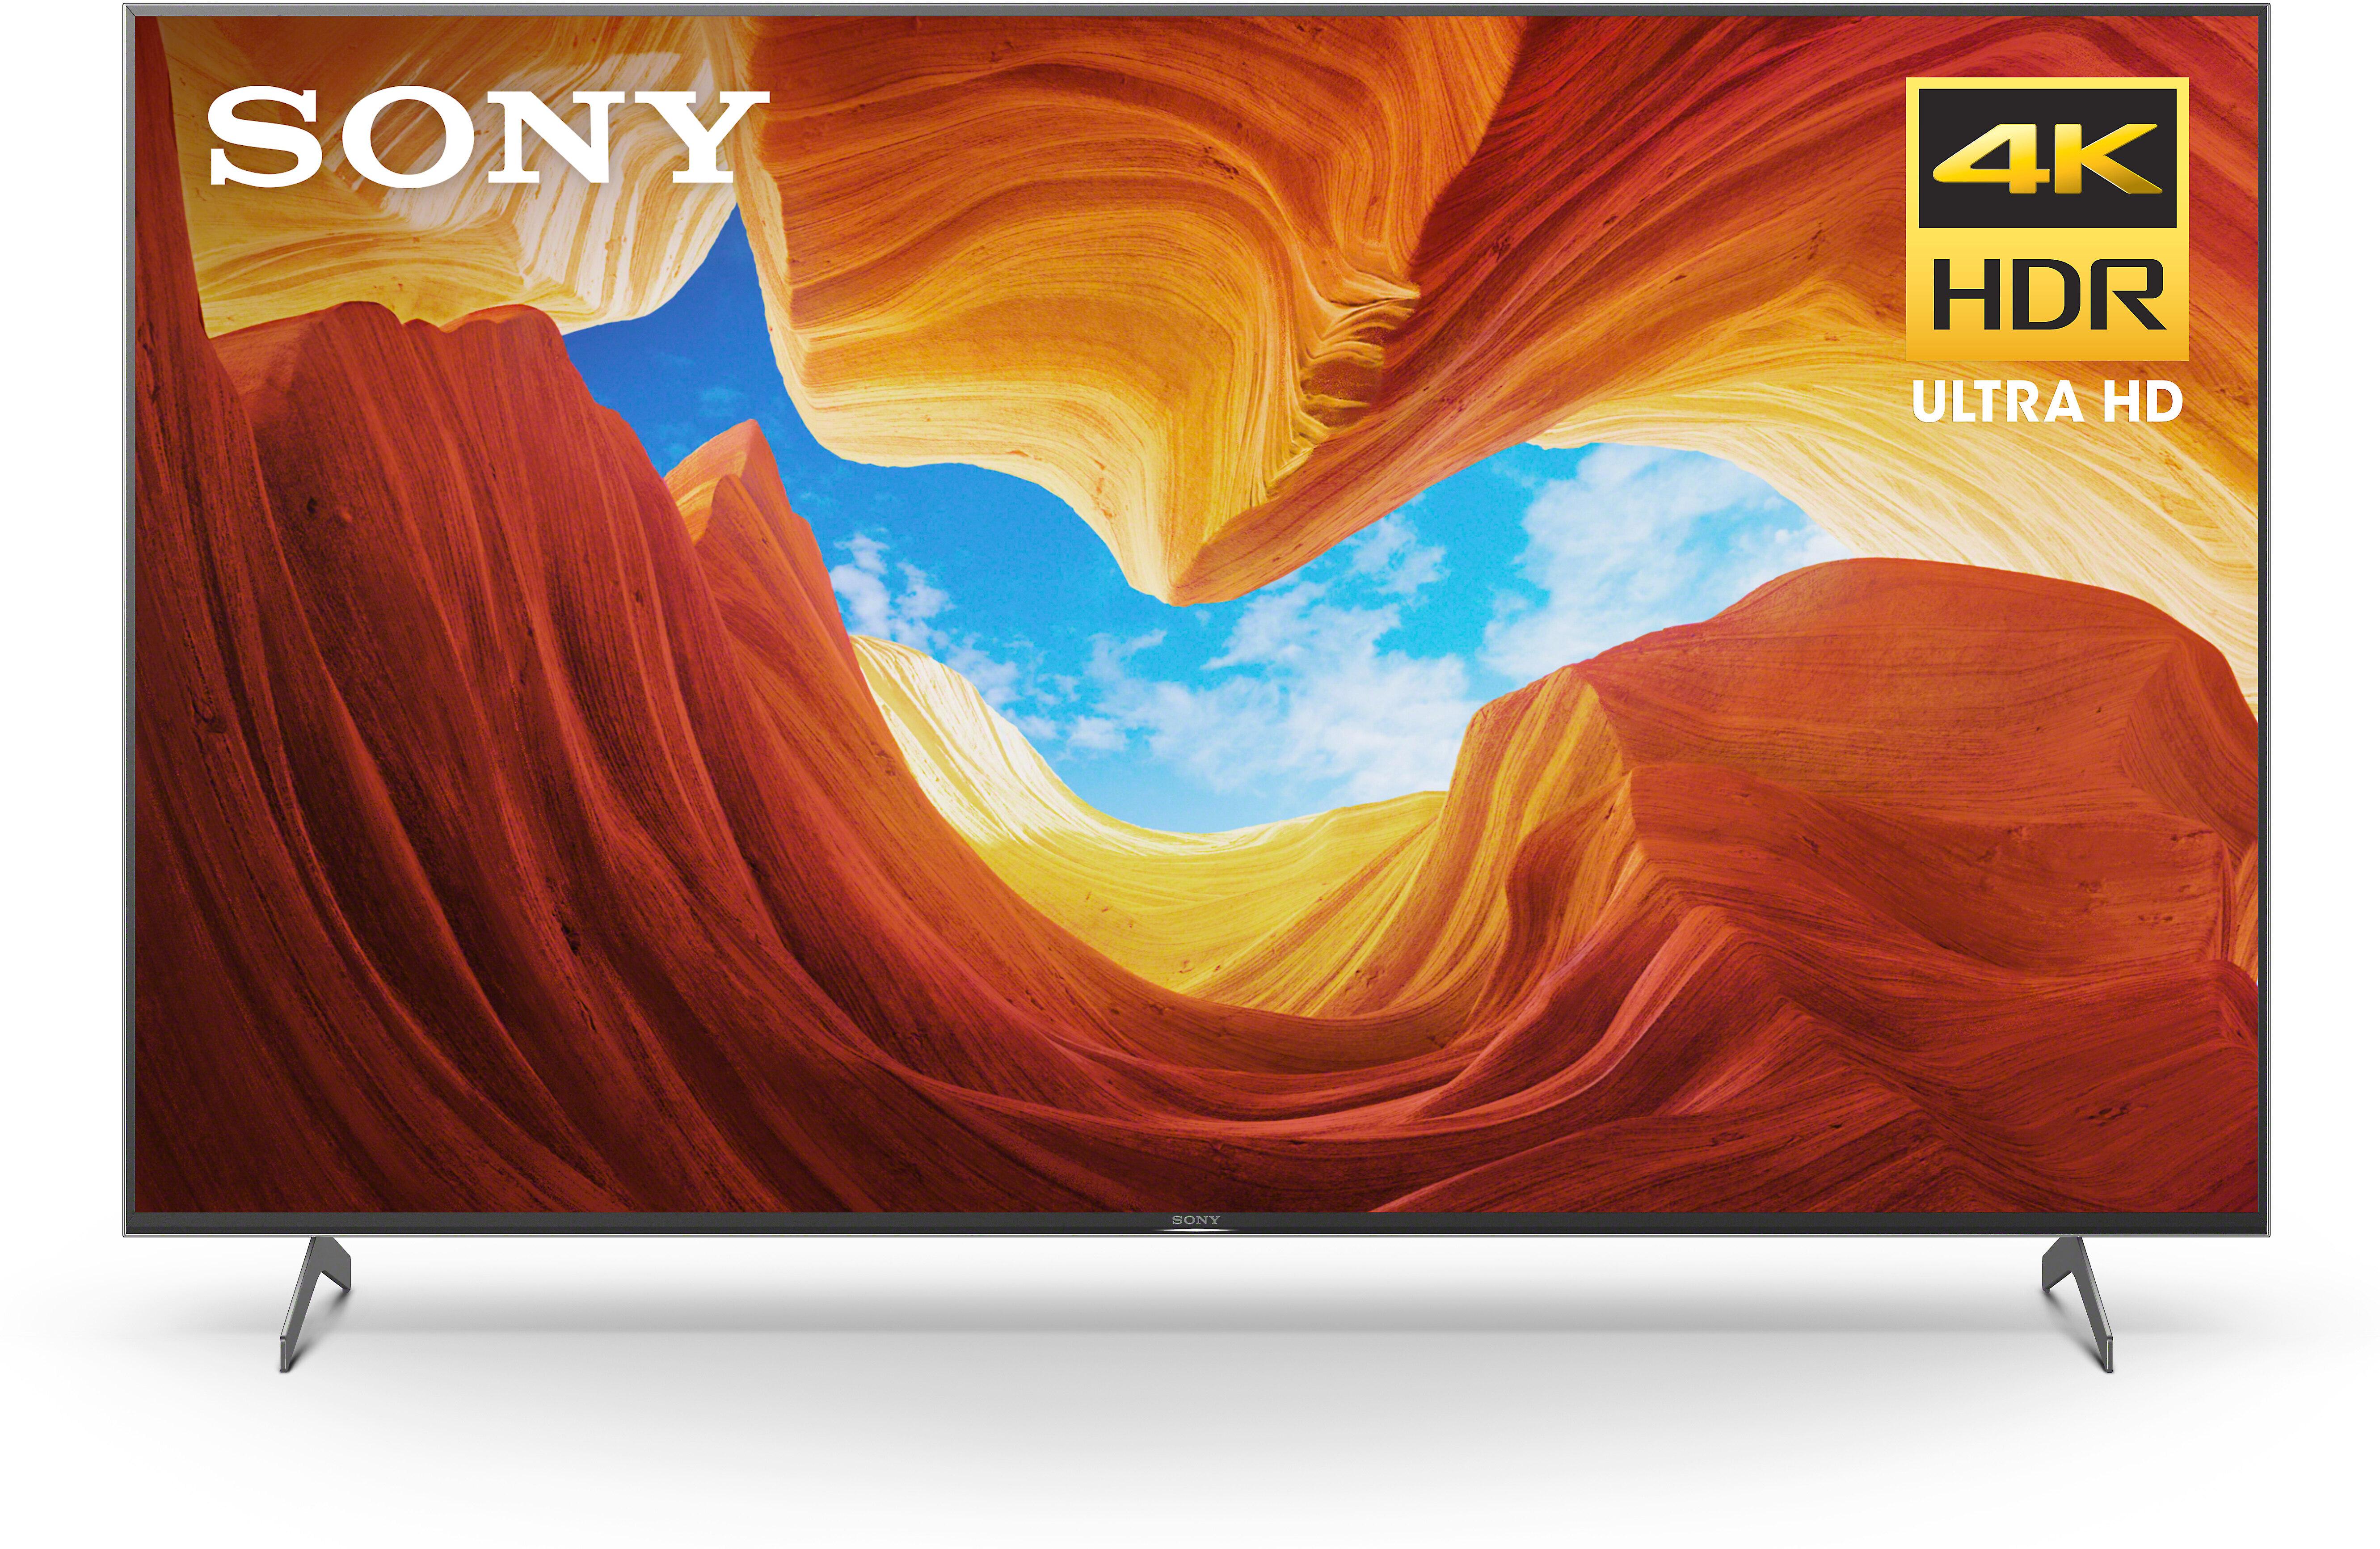 "Sony XBR-75X900H 75""; X900H Smart LED 4K UHD TV with HDR (2020) - $1598 at Crutchfield"